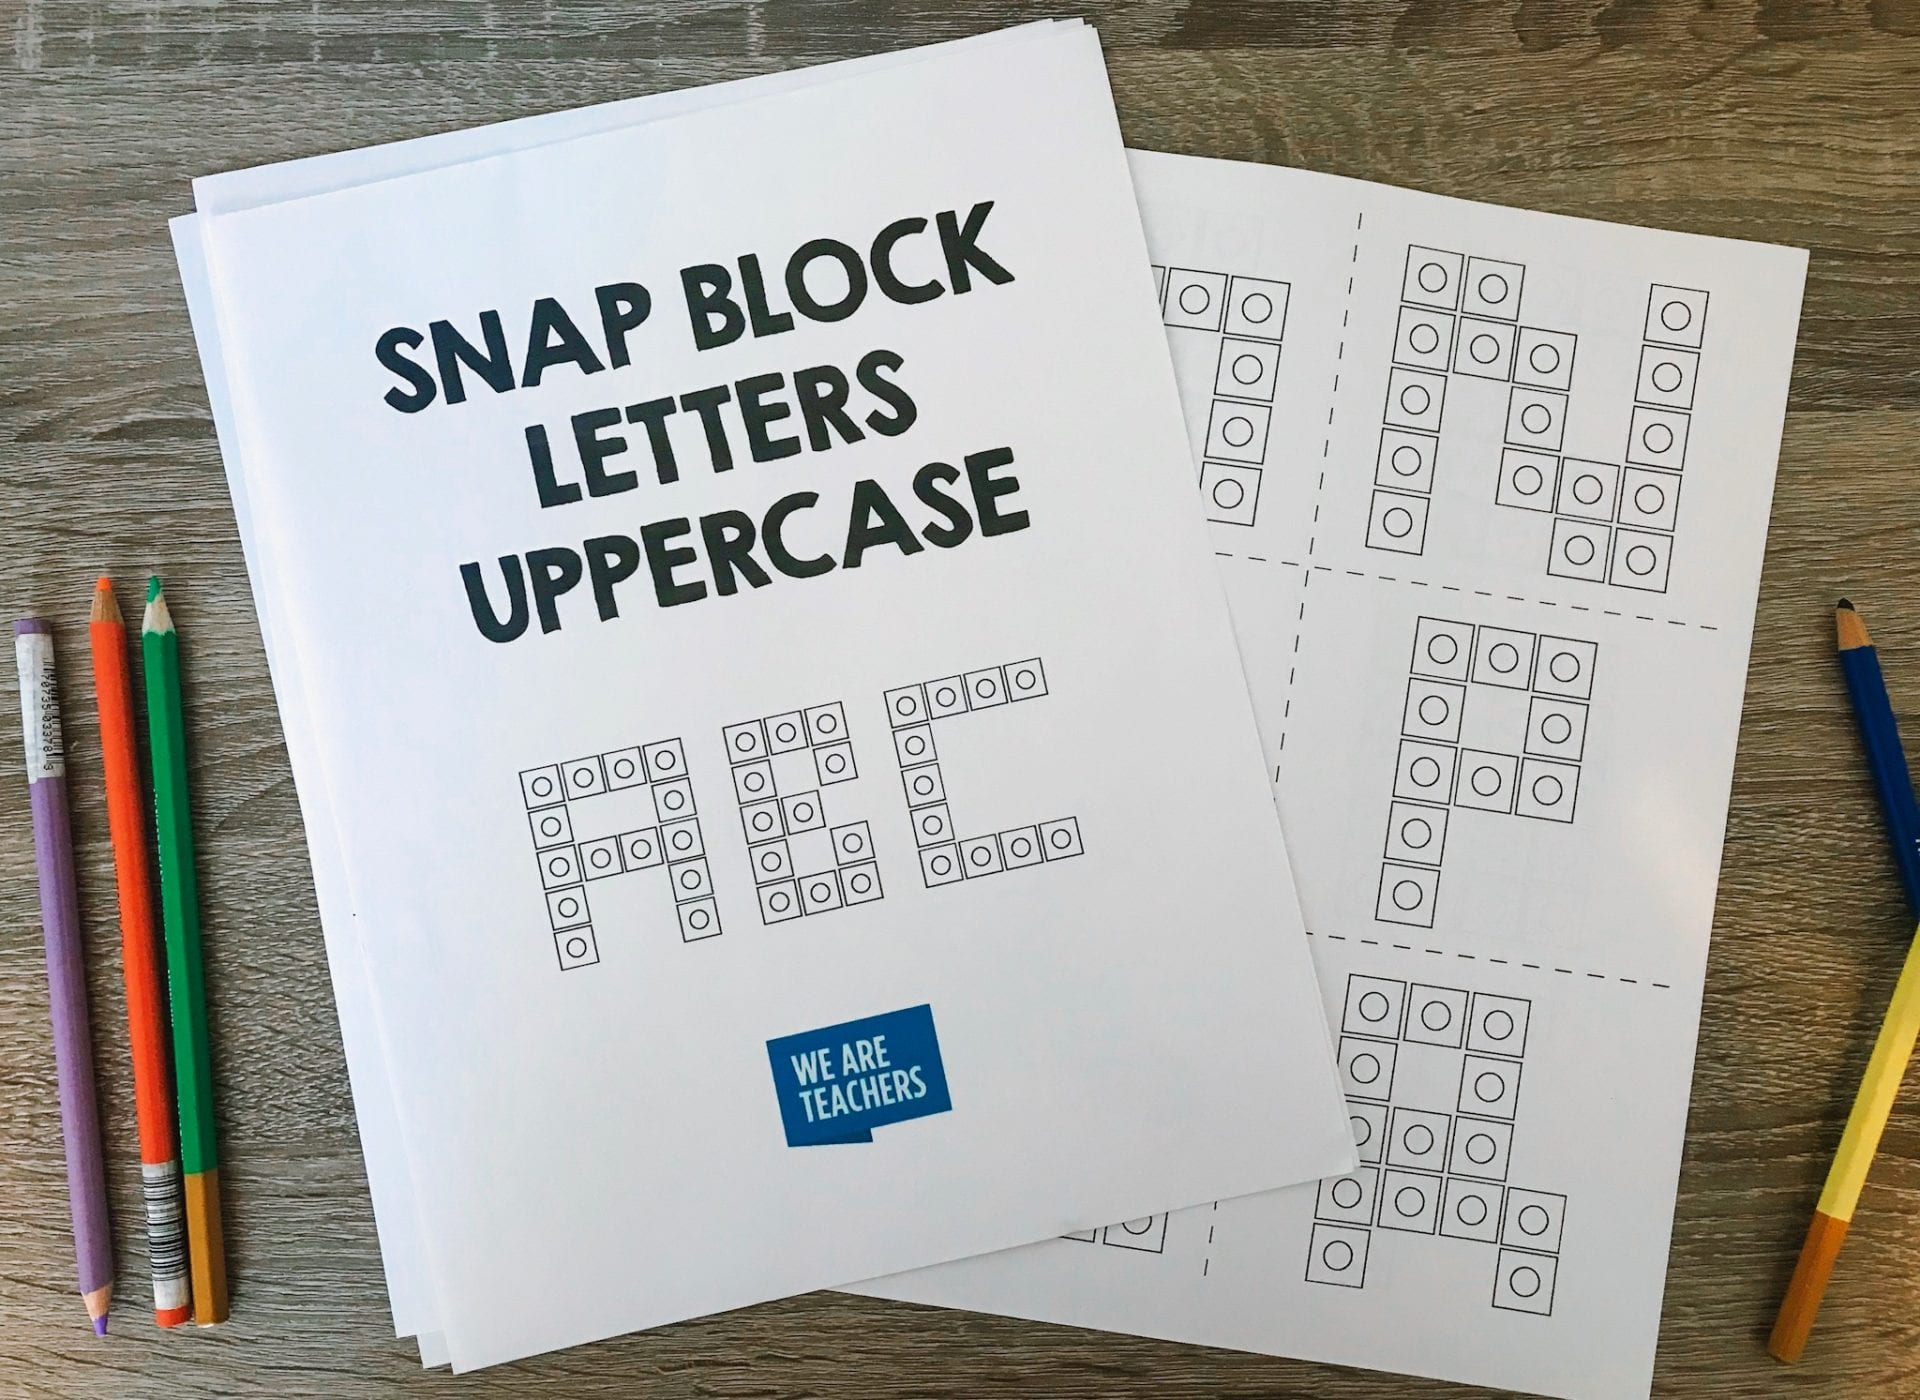 snap block letters